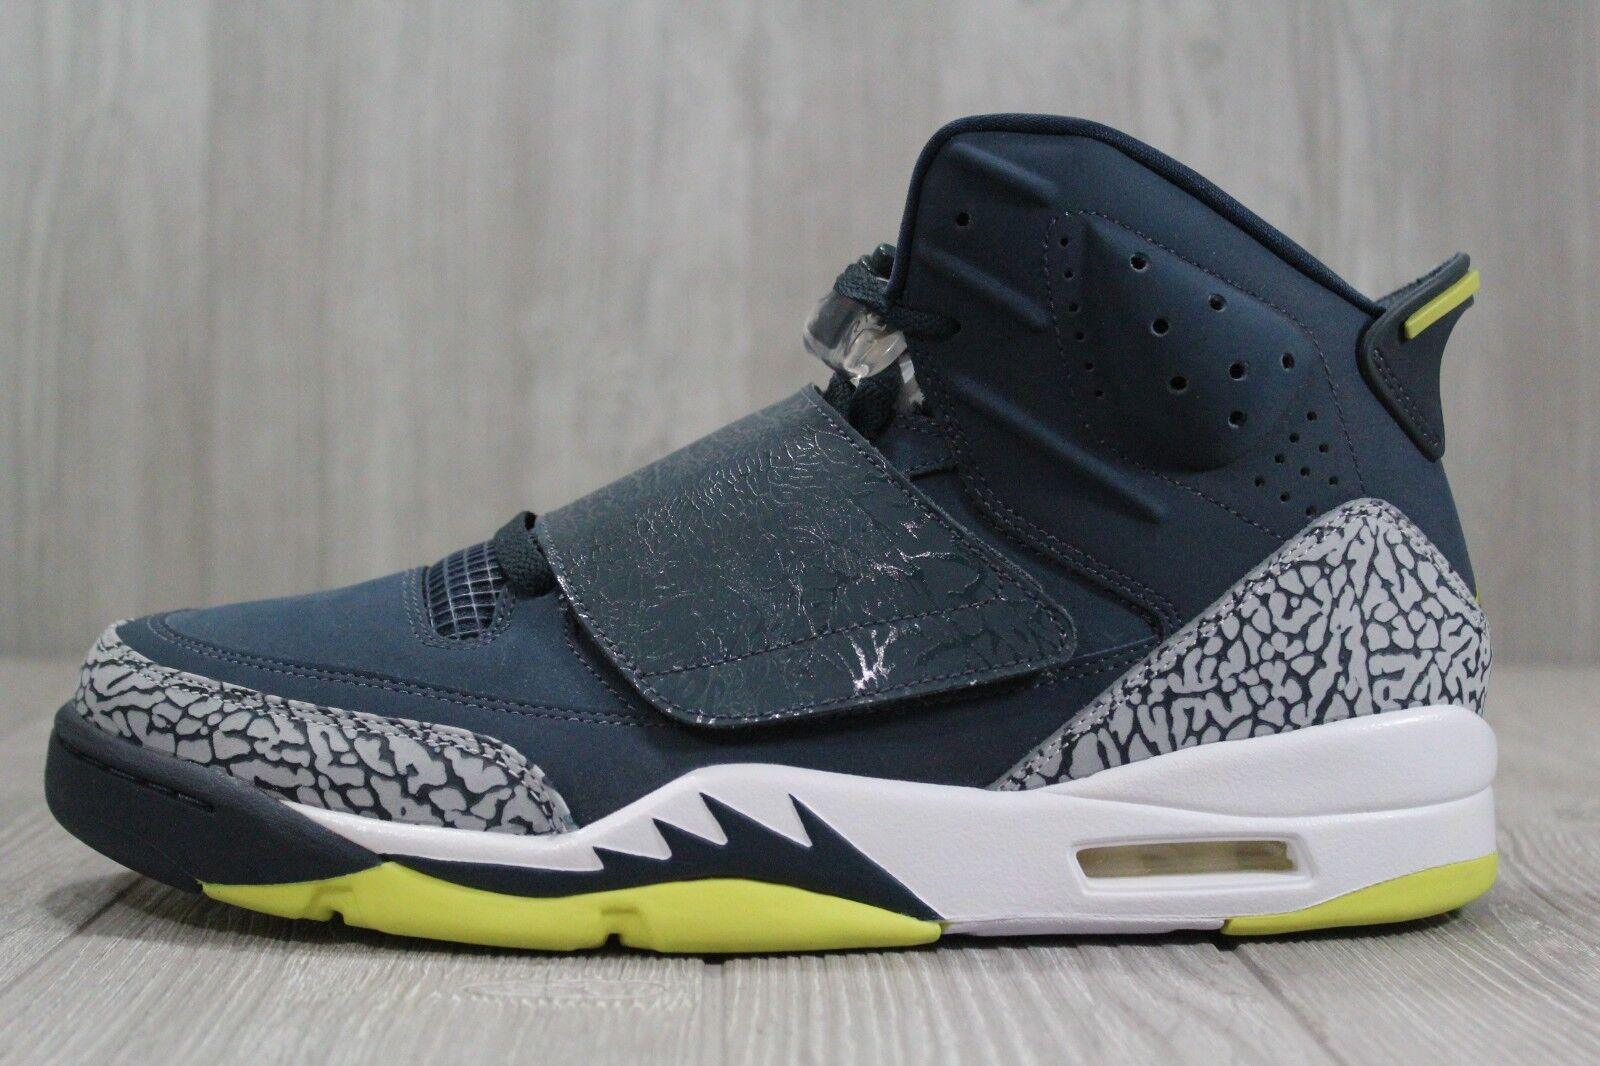 35 New Nike Jordan Son of Mars Spizike Mens 11.5 13 Armory Navy shoes 512245-405